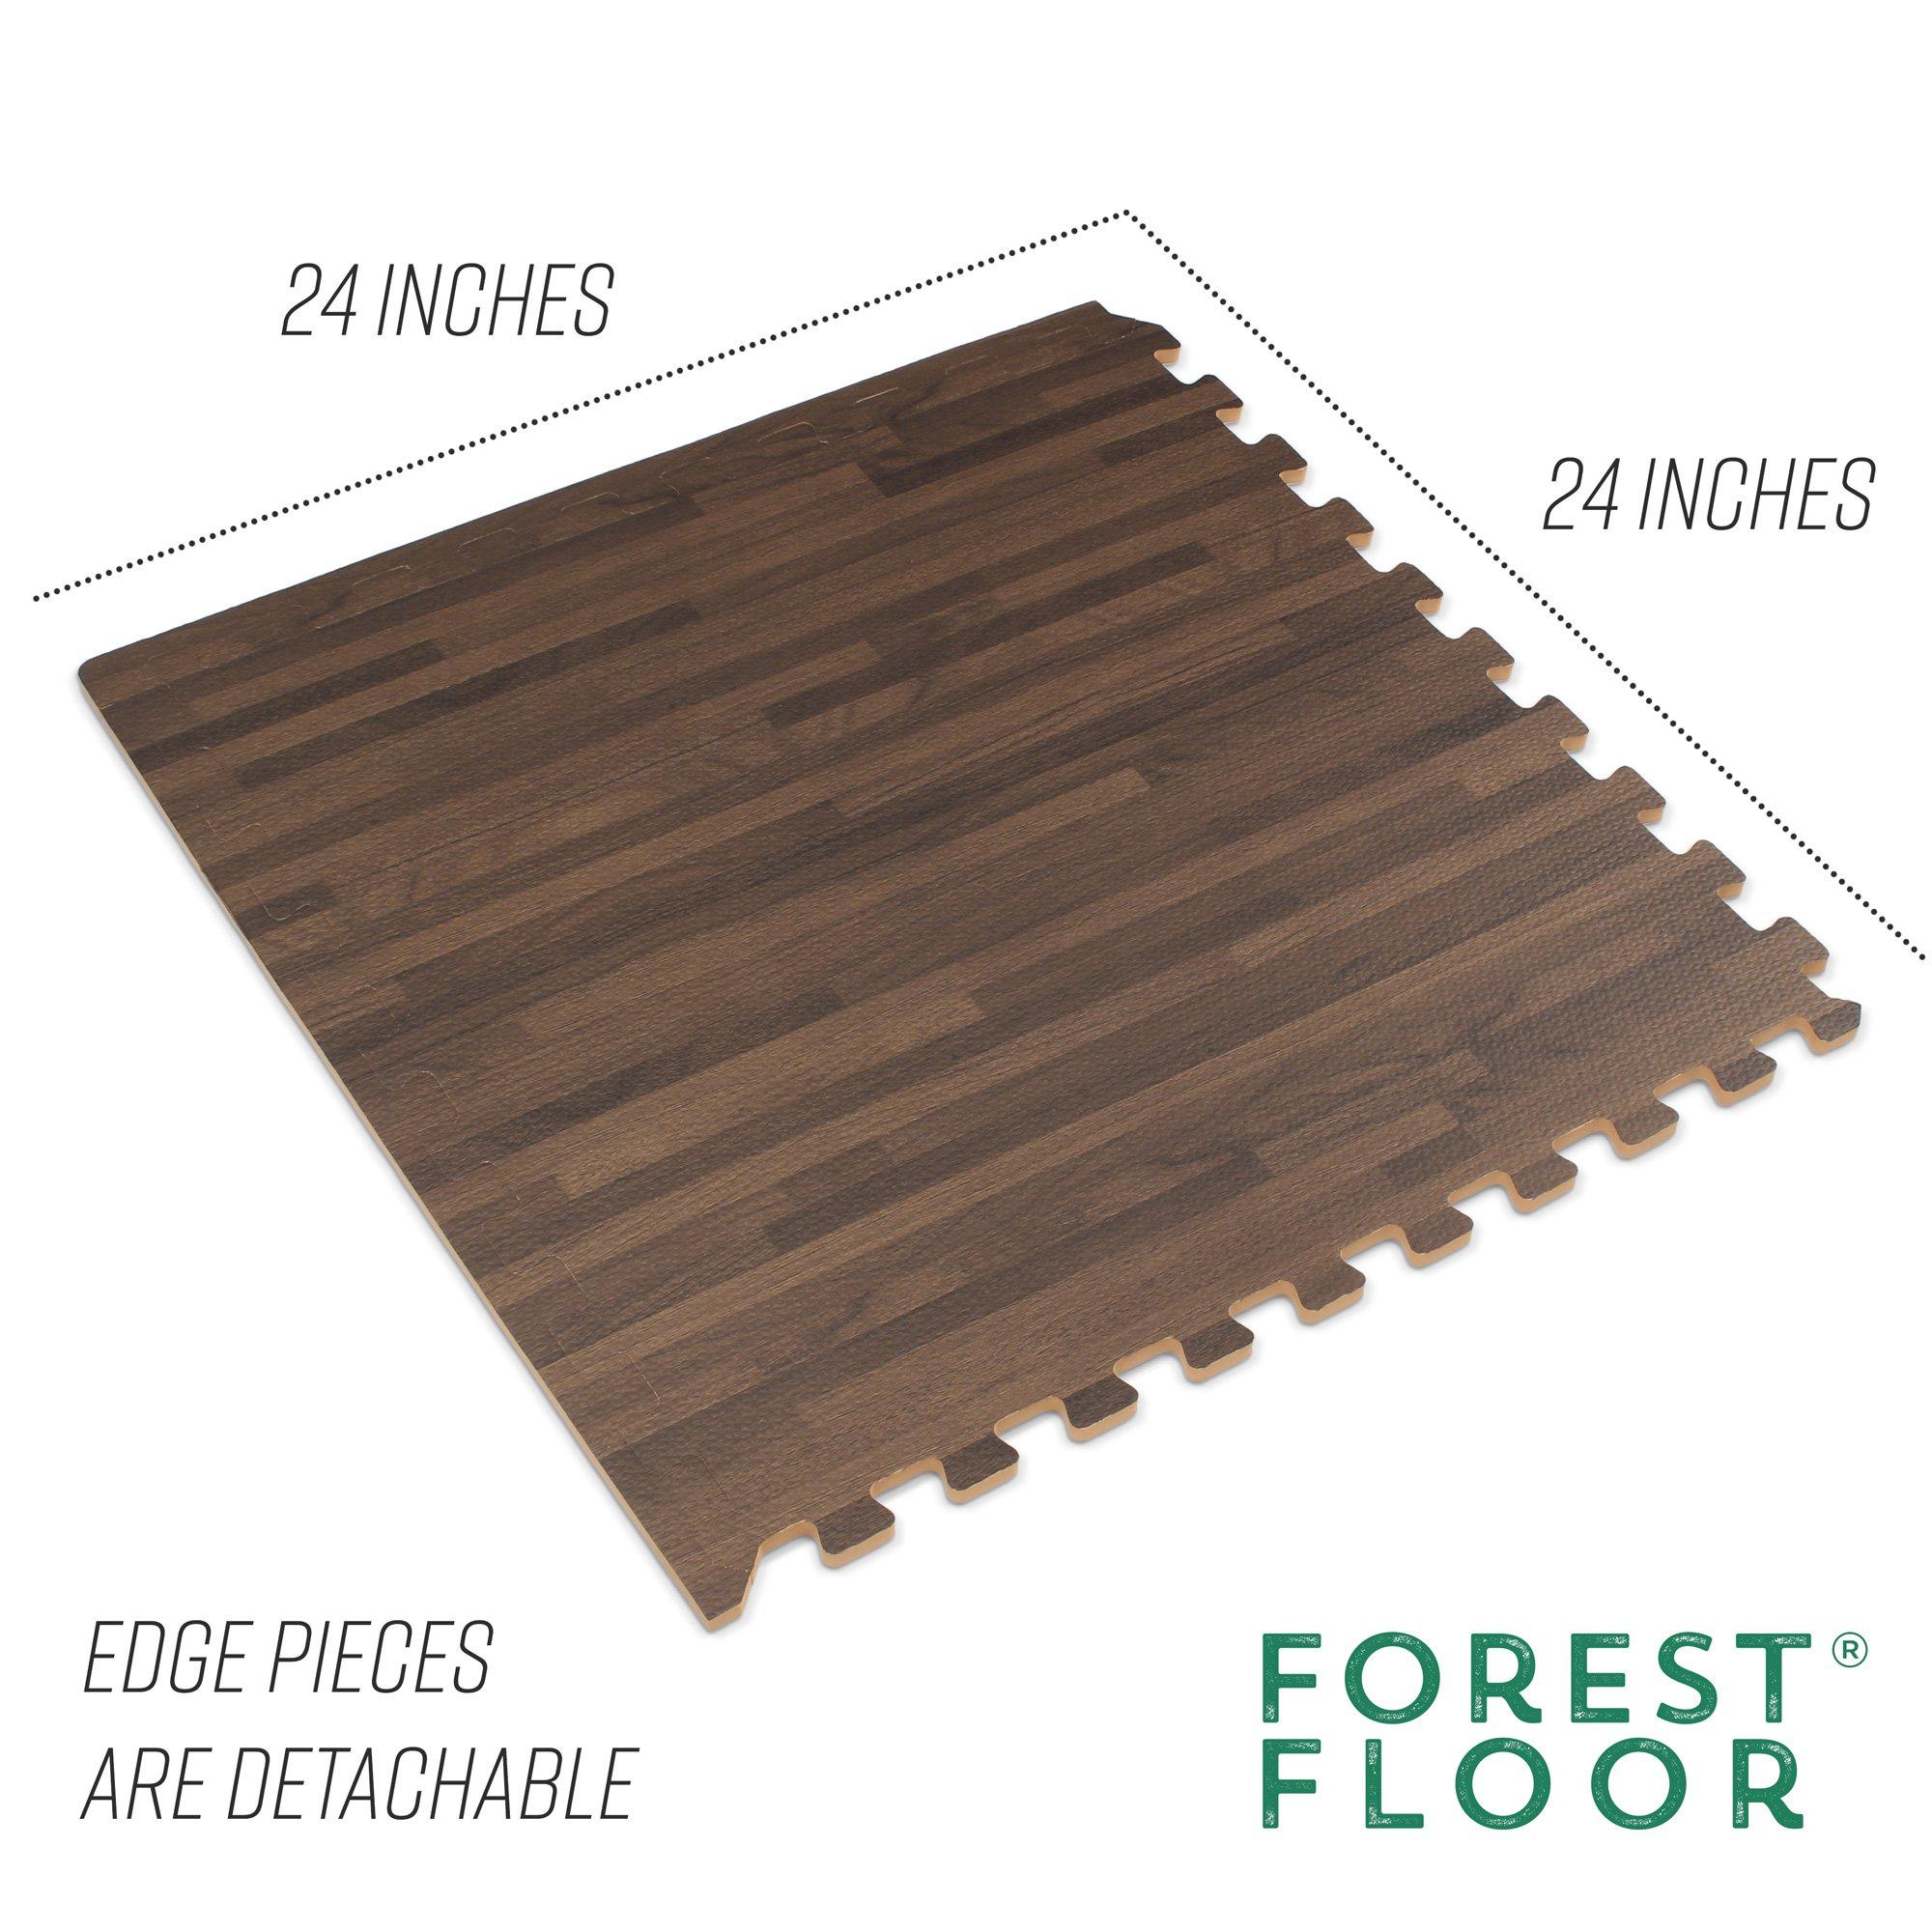 Forest Floor 3/8'' Thick Printed Wood Grain Interlocking Foam Floor Mats, 16 Sq Ft (4 Tiles), Walnut by Forest Floor (Image #4)